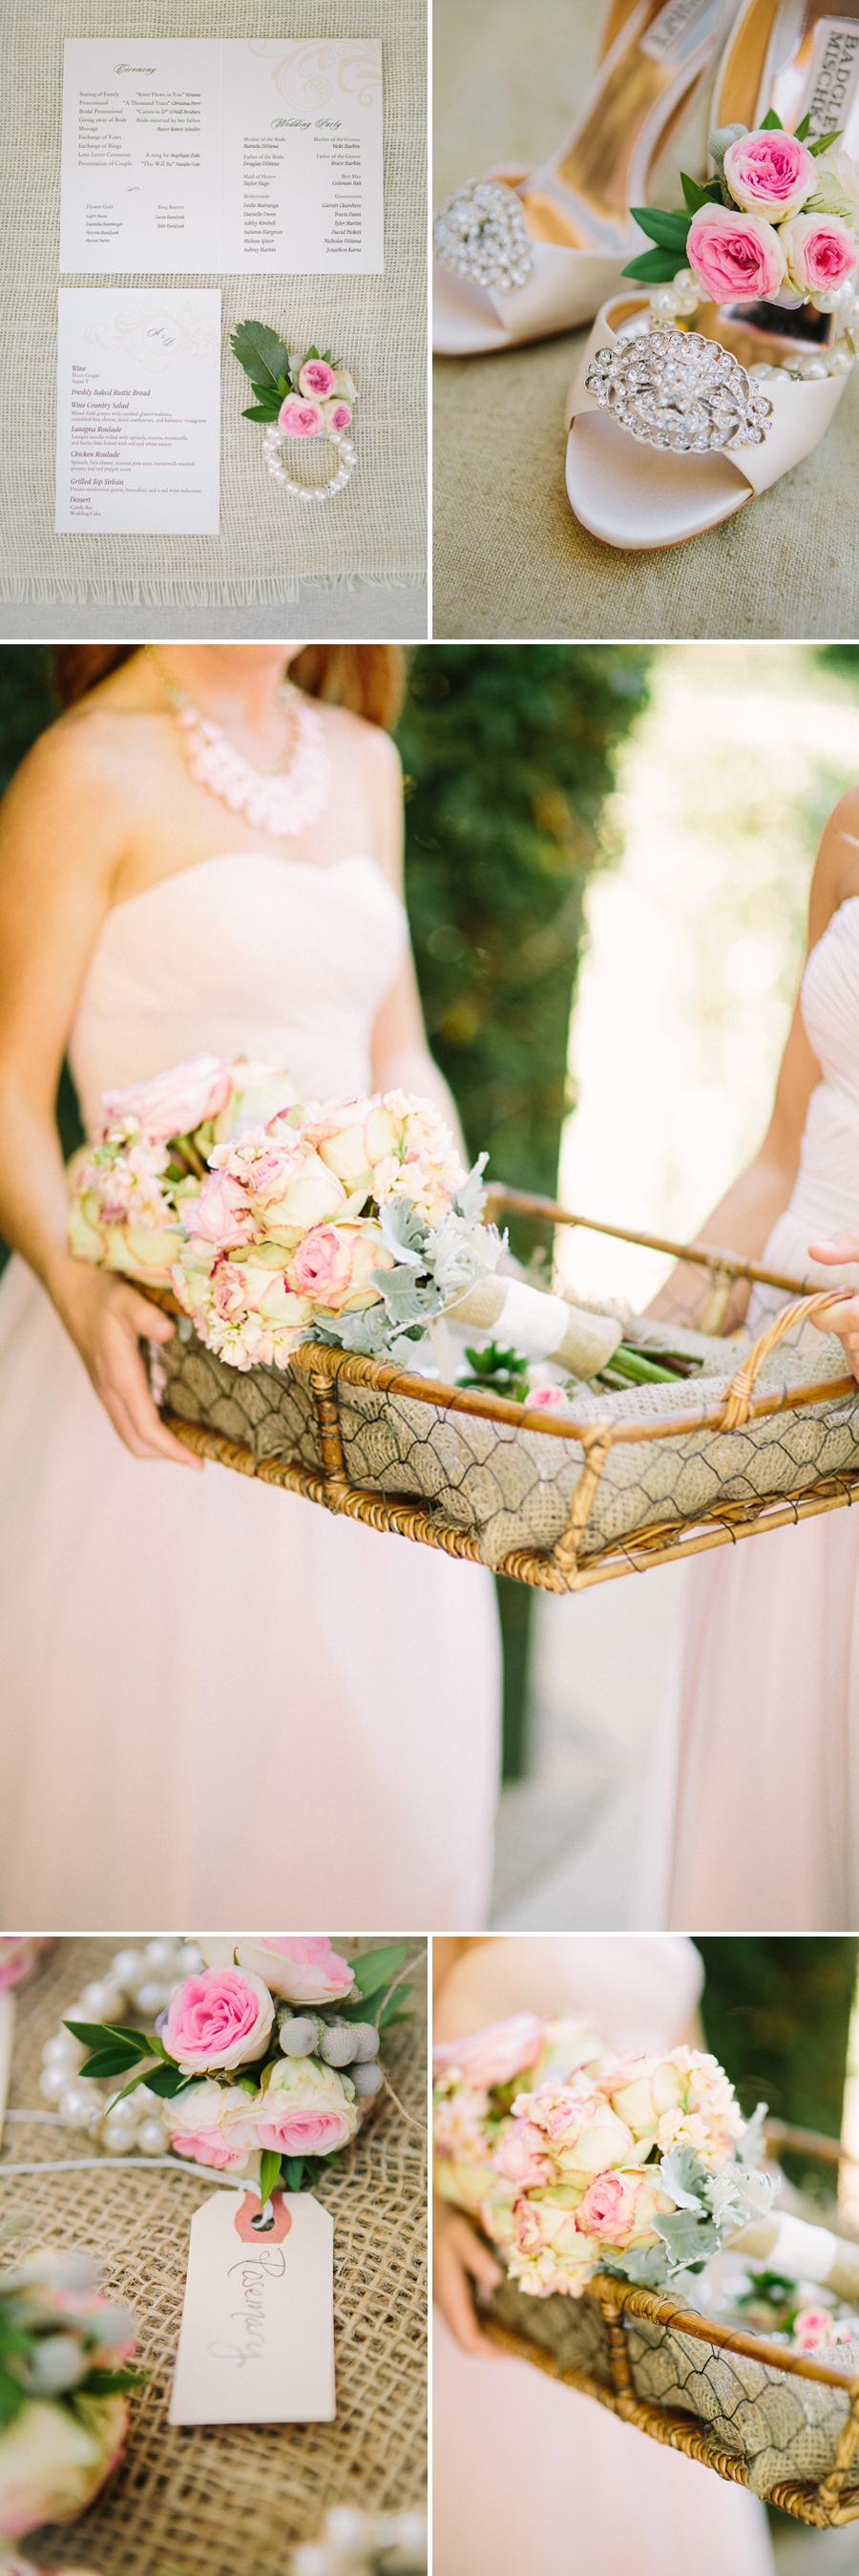 badgley mischka bridal shoes, southern california fine art wedding photographer, ponte winery wedding, vineyard wedding, winery wedding, temecula wedding, glowy wedding photography, fine art photography